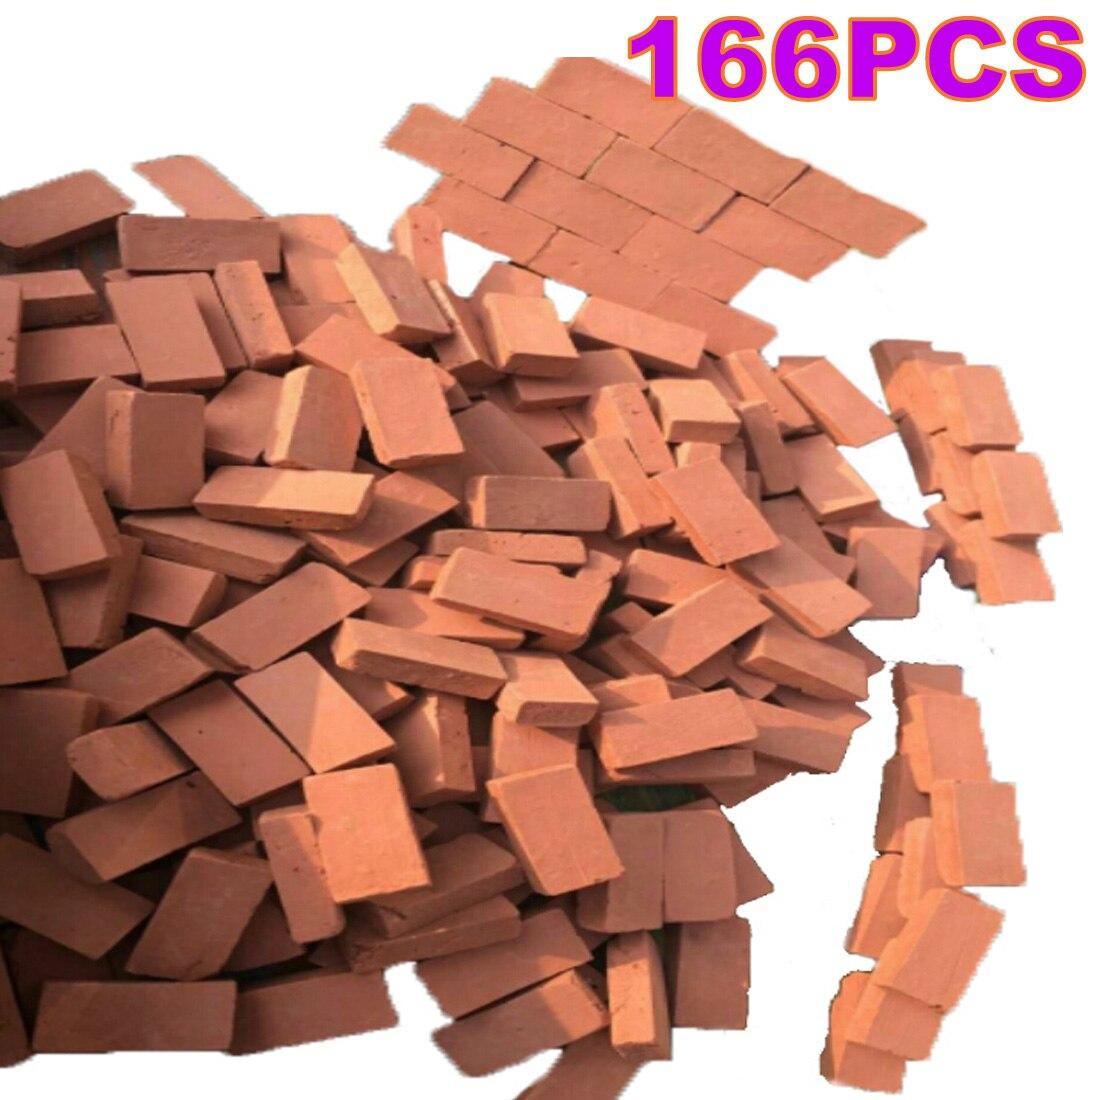 50/166Pcs 1:16 Scale Mini Red Bricks Model Antique Micro Landscape Decorative Bricks For DIY WWII Sand Table Building Orange Red